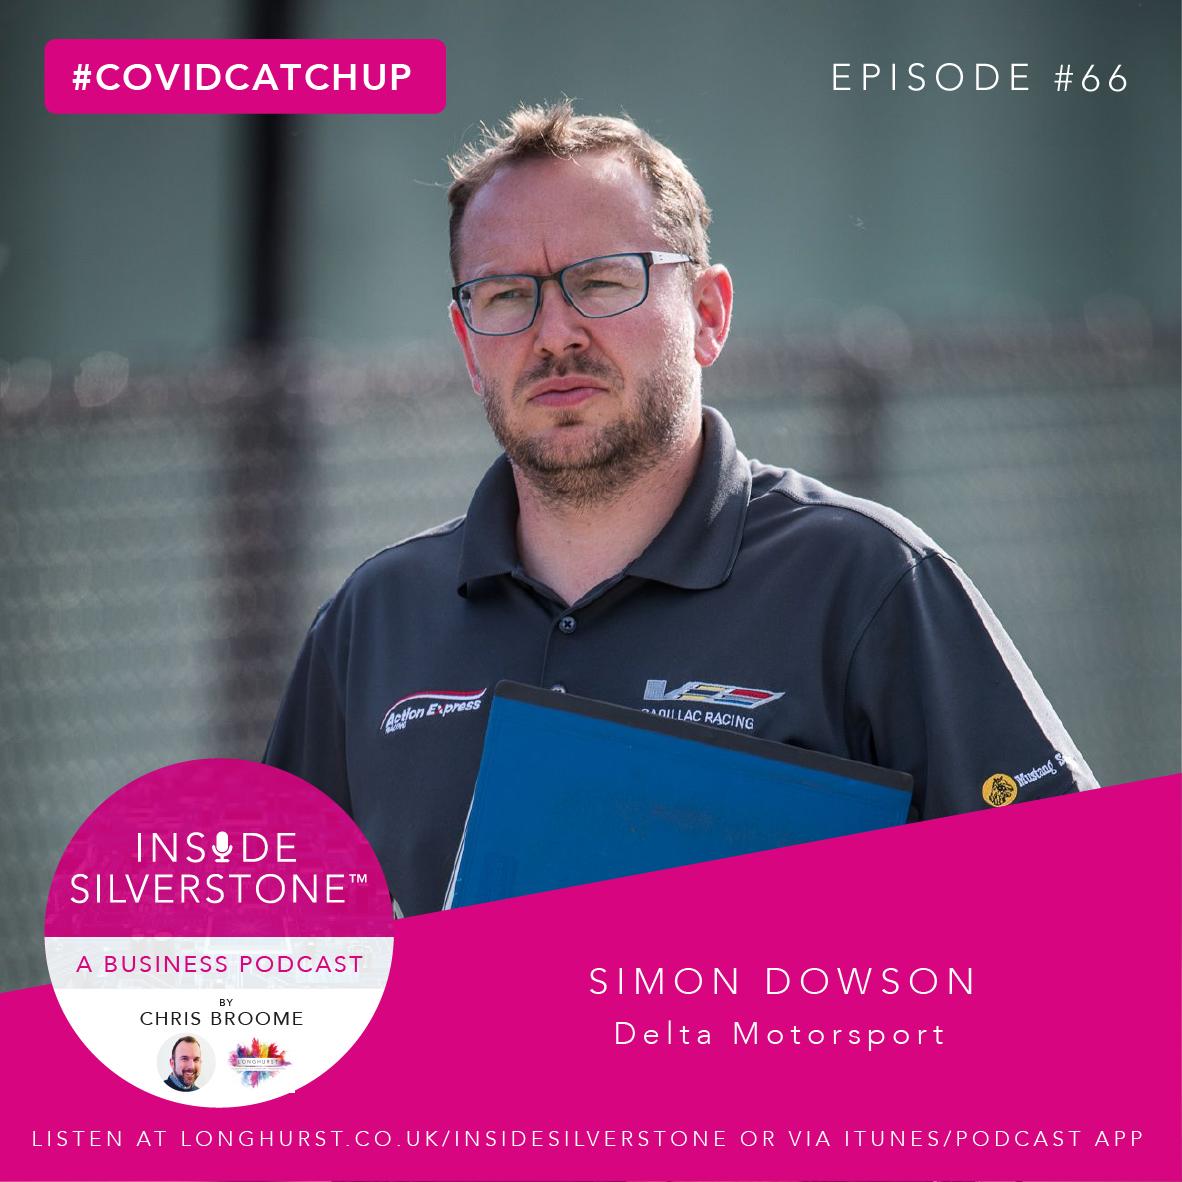 Simon Dowson of Delta Motorsport